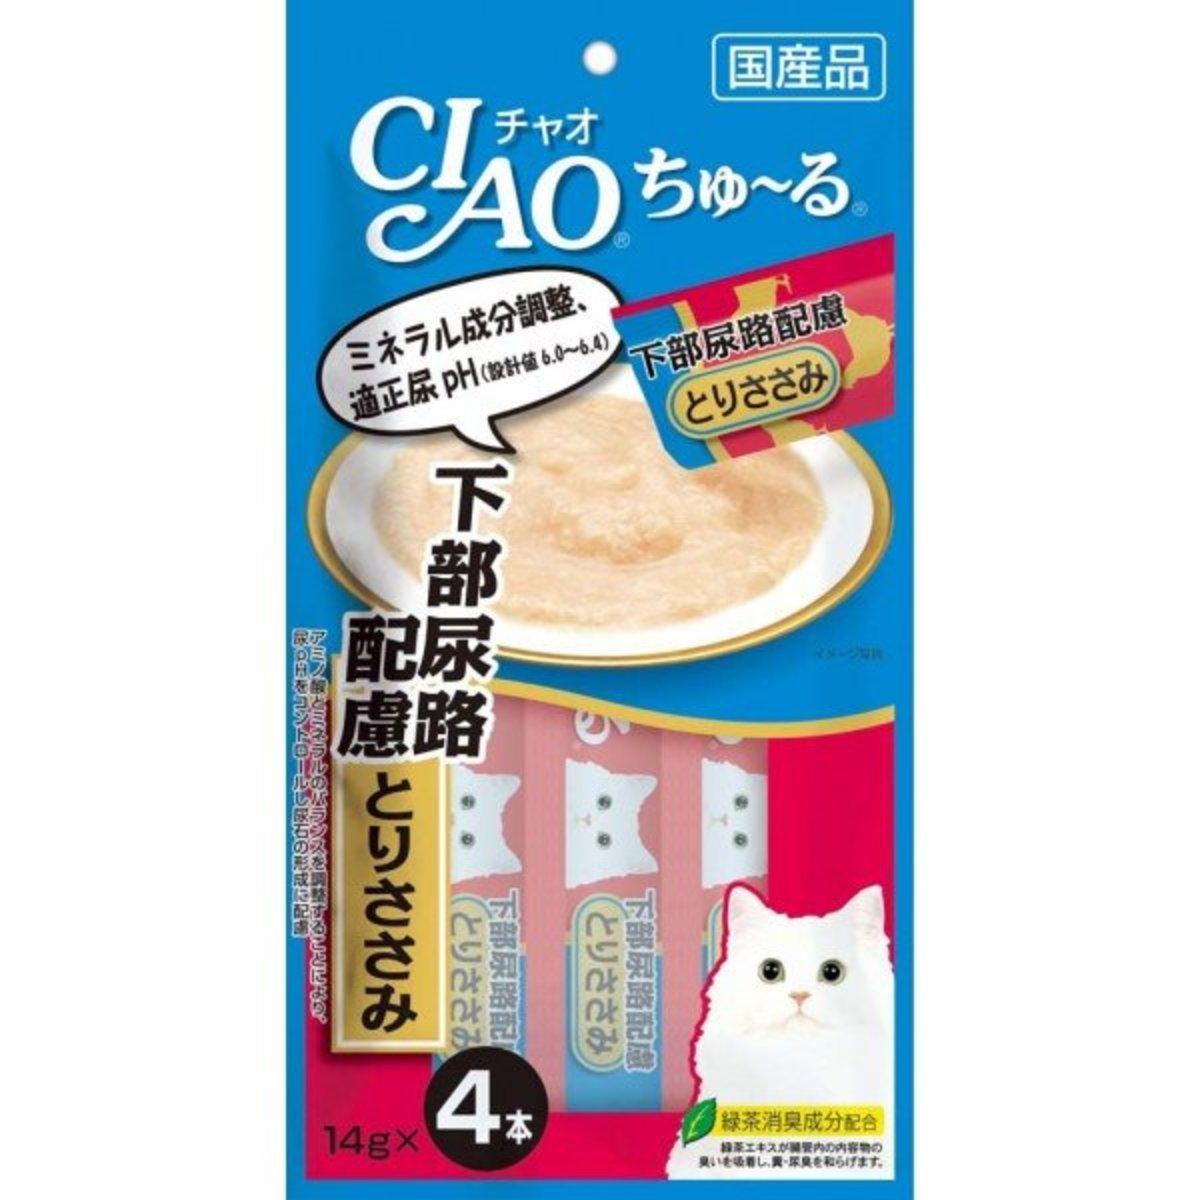 CIAO Churu Chicken Puree - Kidney Stone Prevention (14g x 4) #SC-106